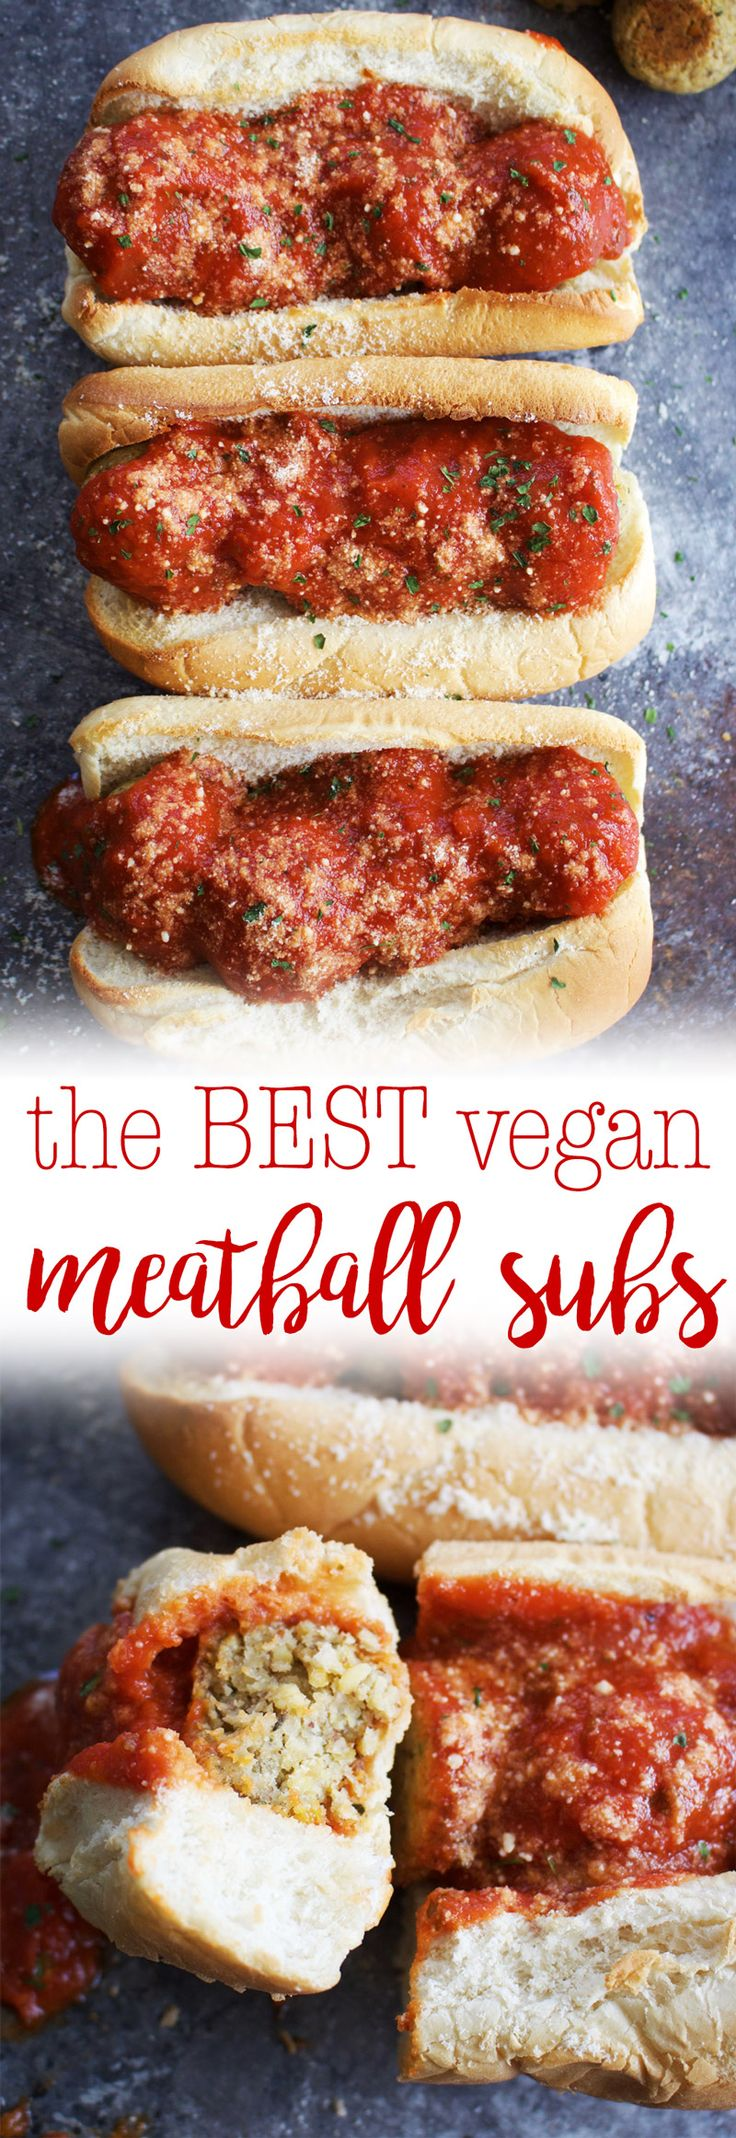 A sandwich that'll make you wonder, why isn't everyone vegan?